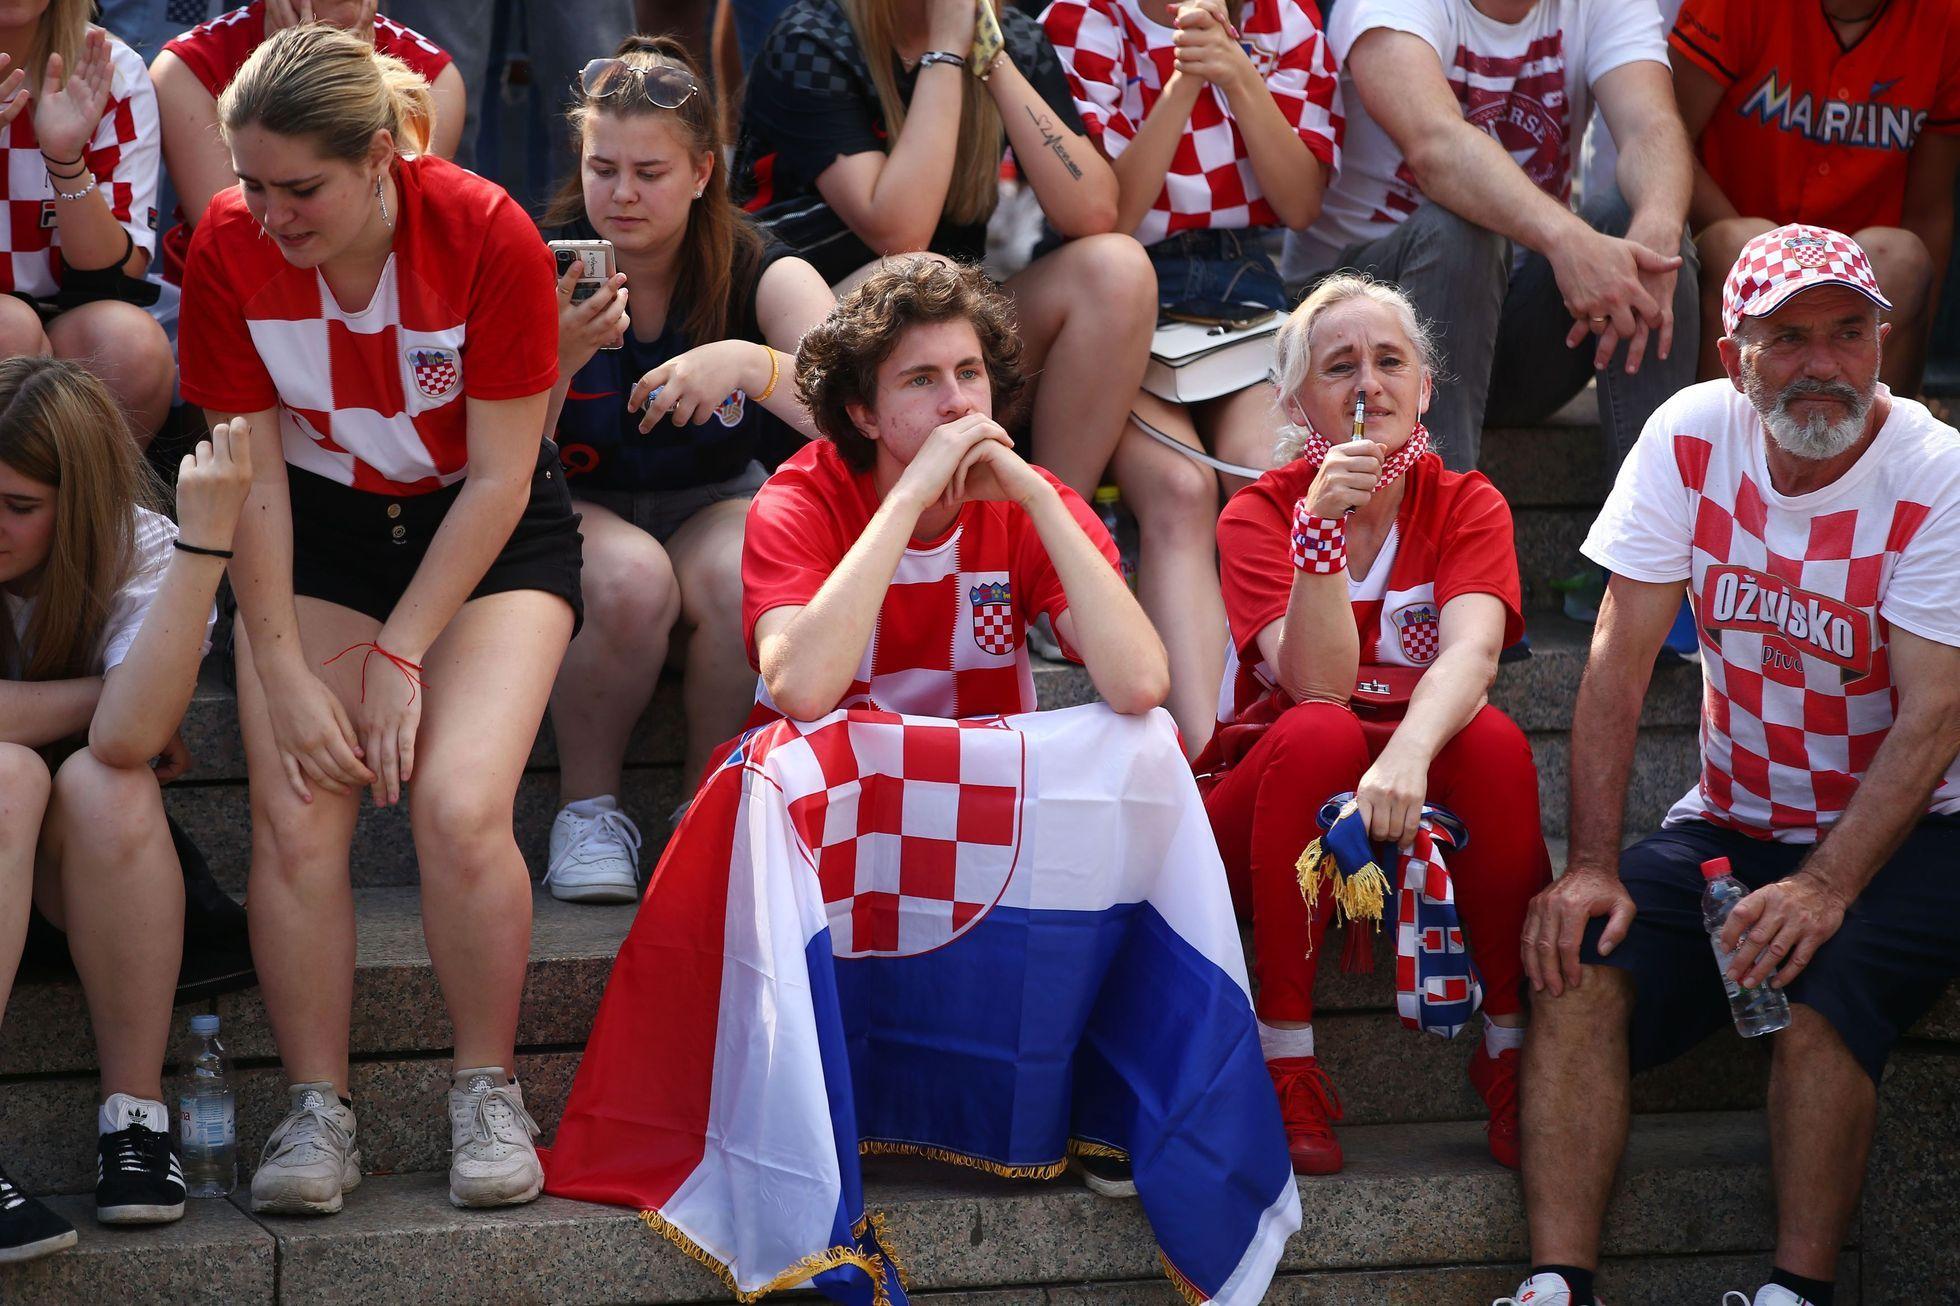 Watch Schick?  All Czechs are dangerous, the Croats are afraid of a key battle